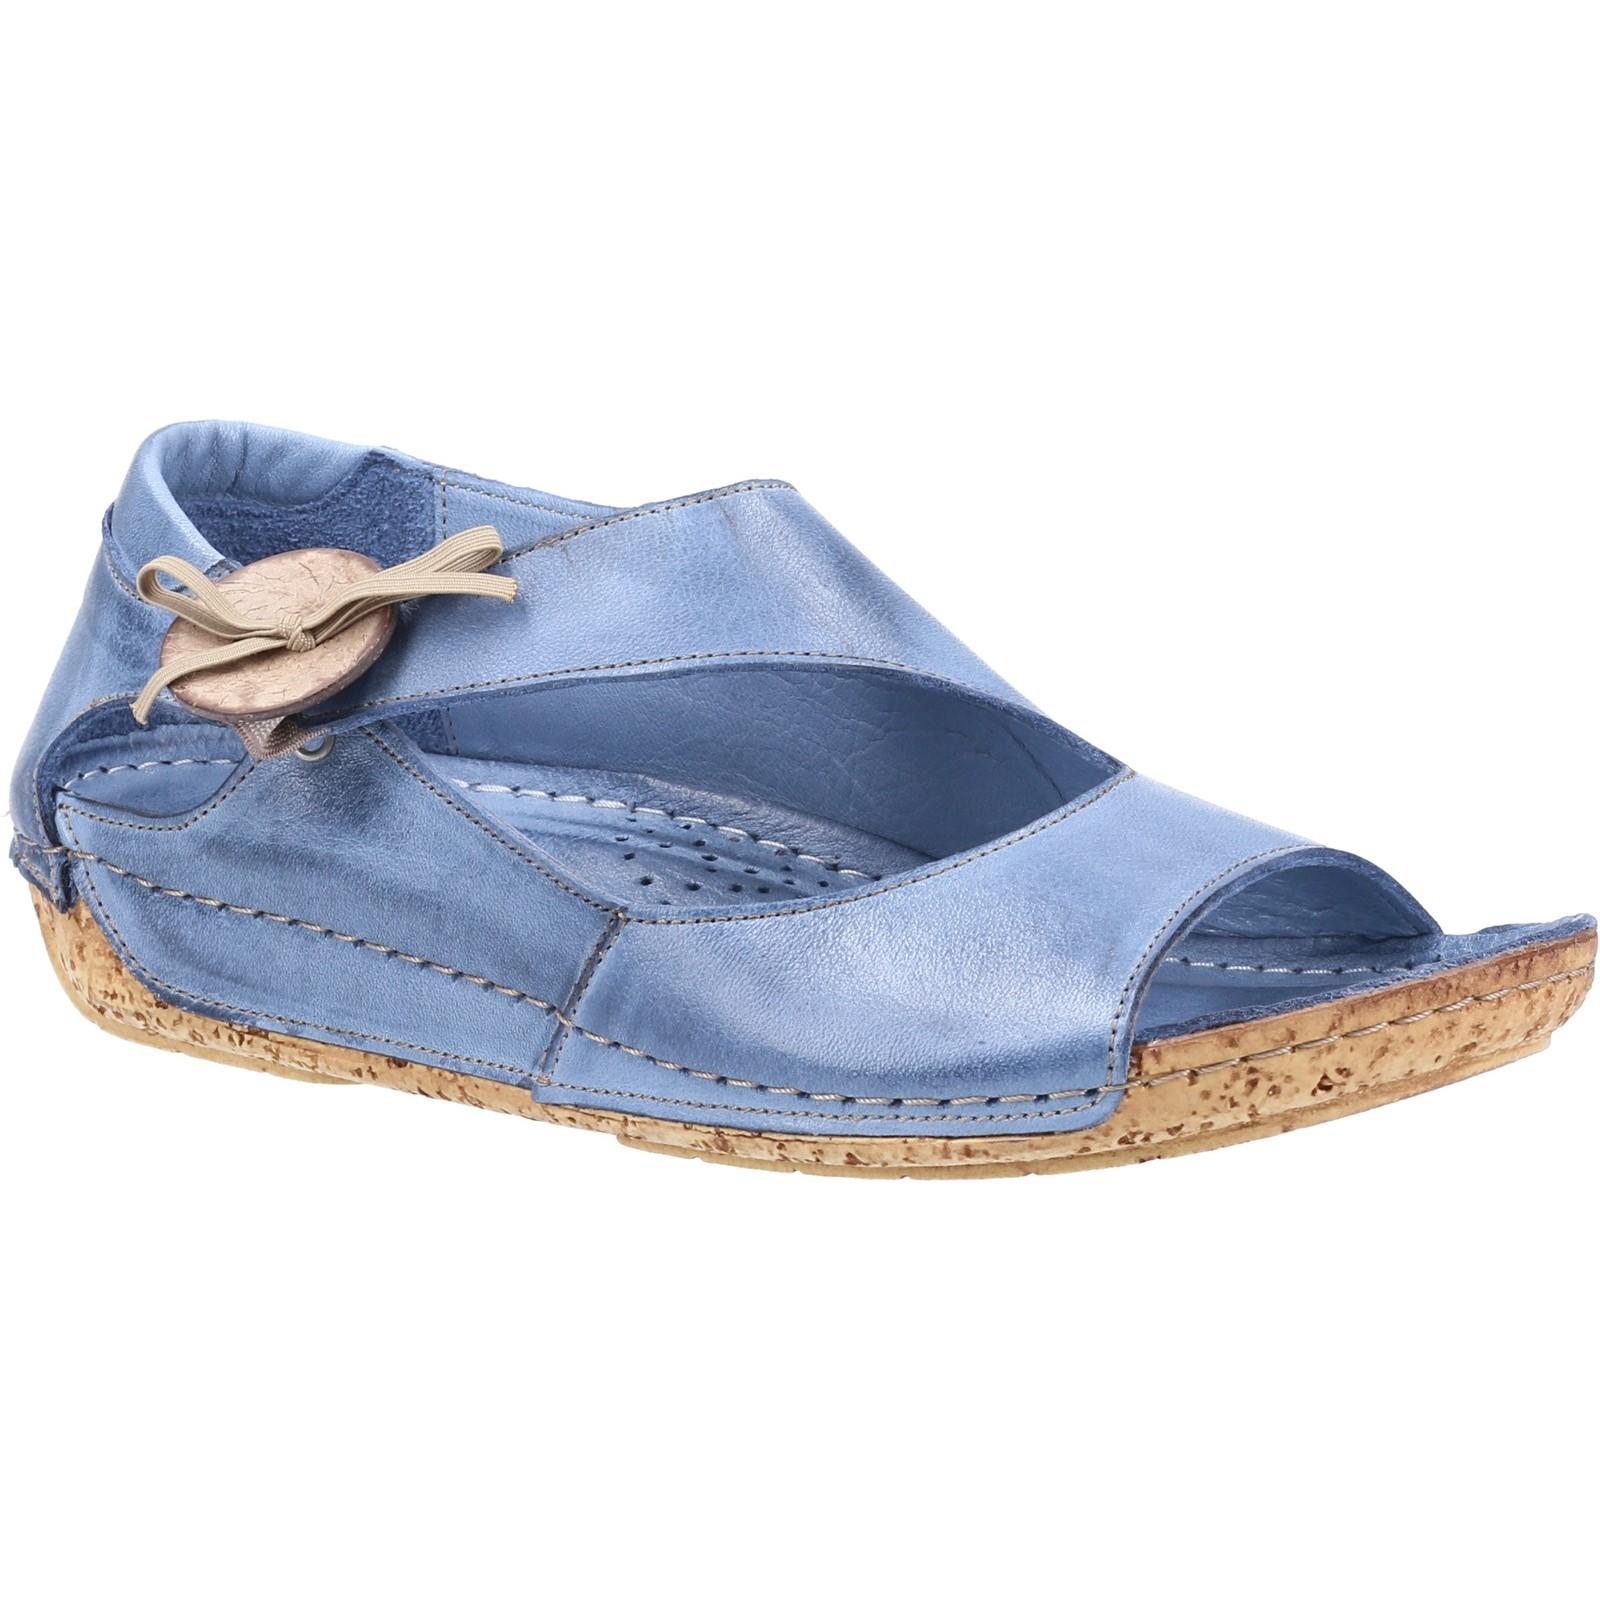 Riva Donna Cartier Sandalo Sandalo Sandalo da Infilare Jeans Taglia Eu 42 25091b